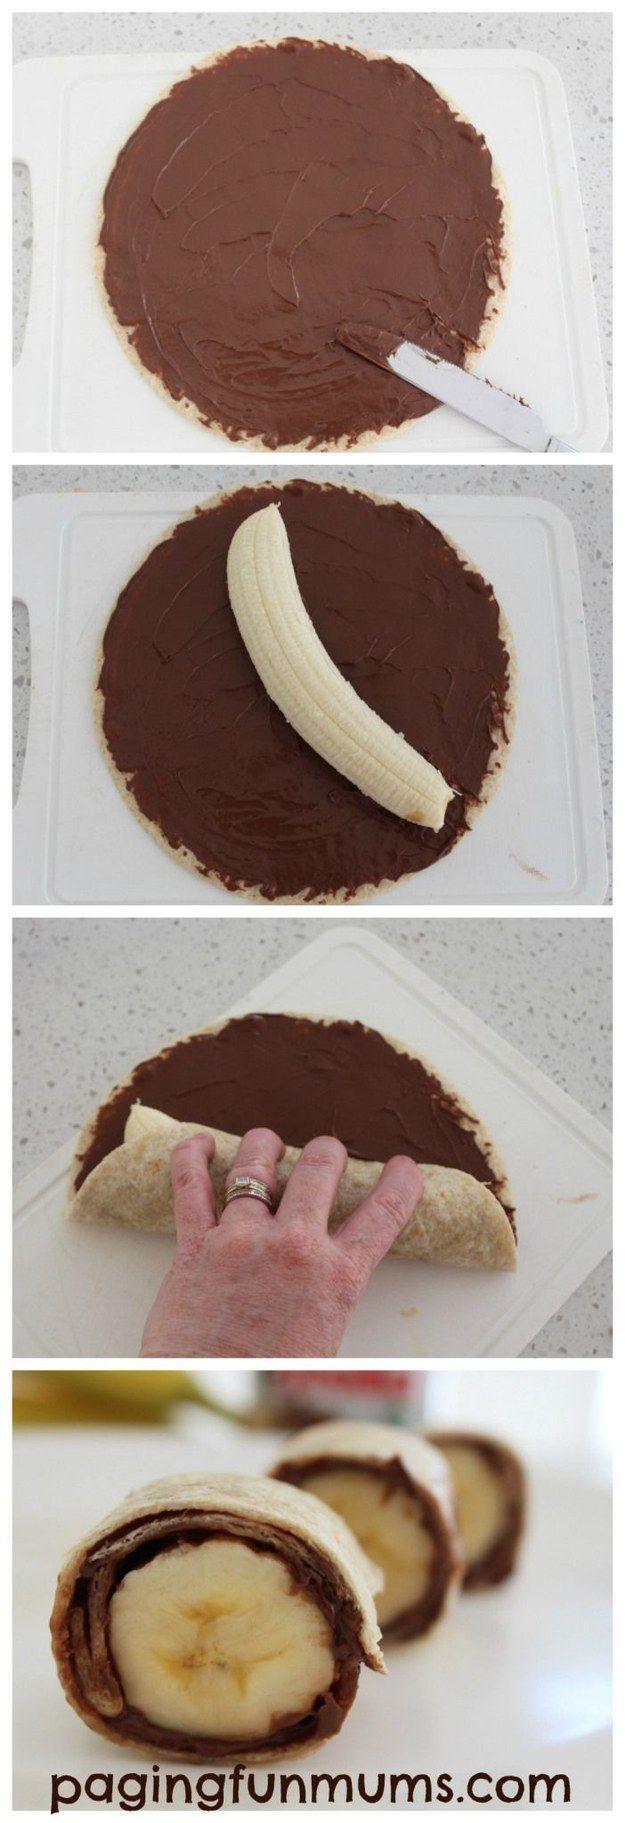 Nutella & Banana Sushi | 21 Easy Back-To-School Breakfast Ideas Kids Will Love